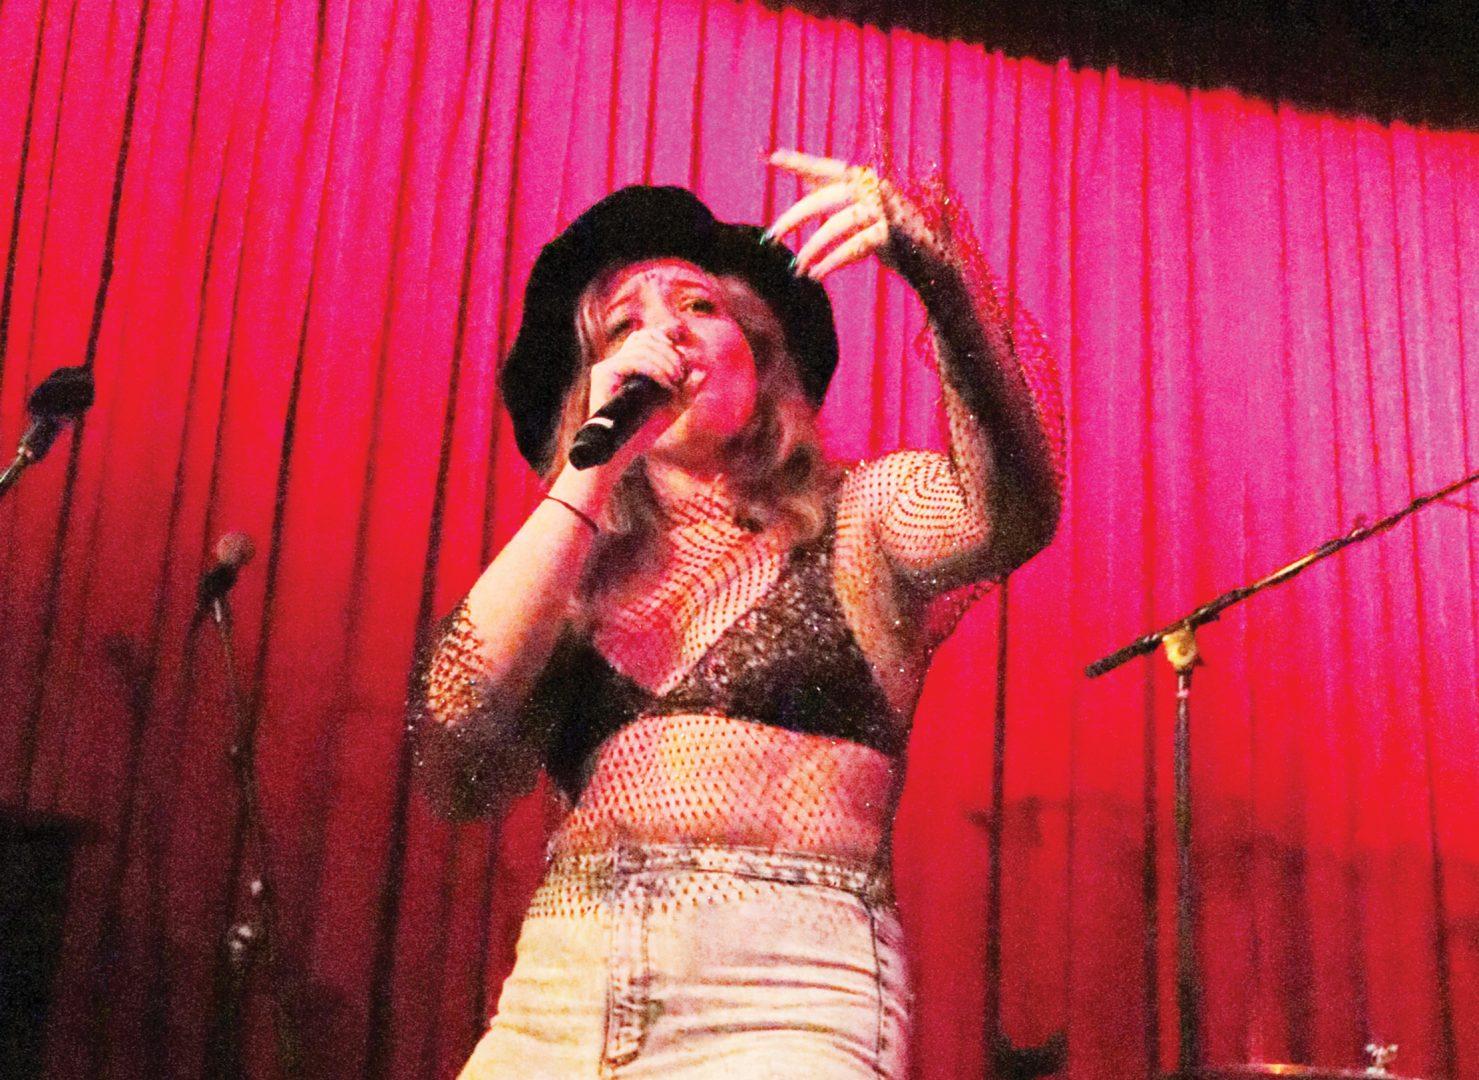 Foto28 Kimberly Barbosa Lily Lyon faz turnê na Costa Leste dos EUA